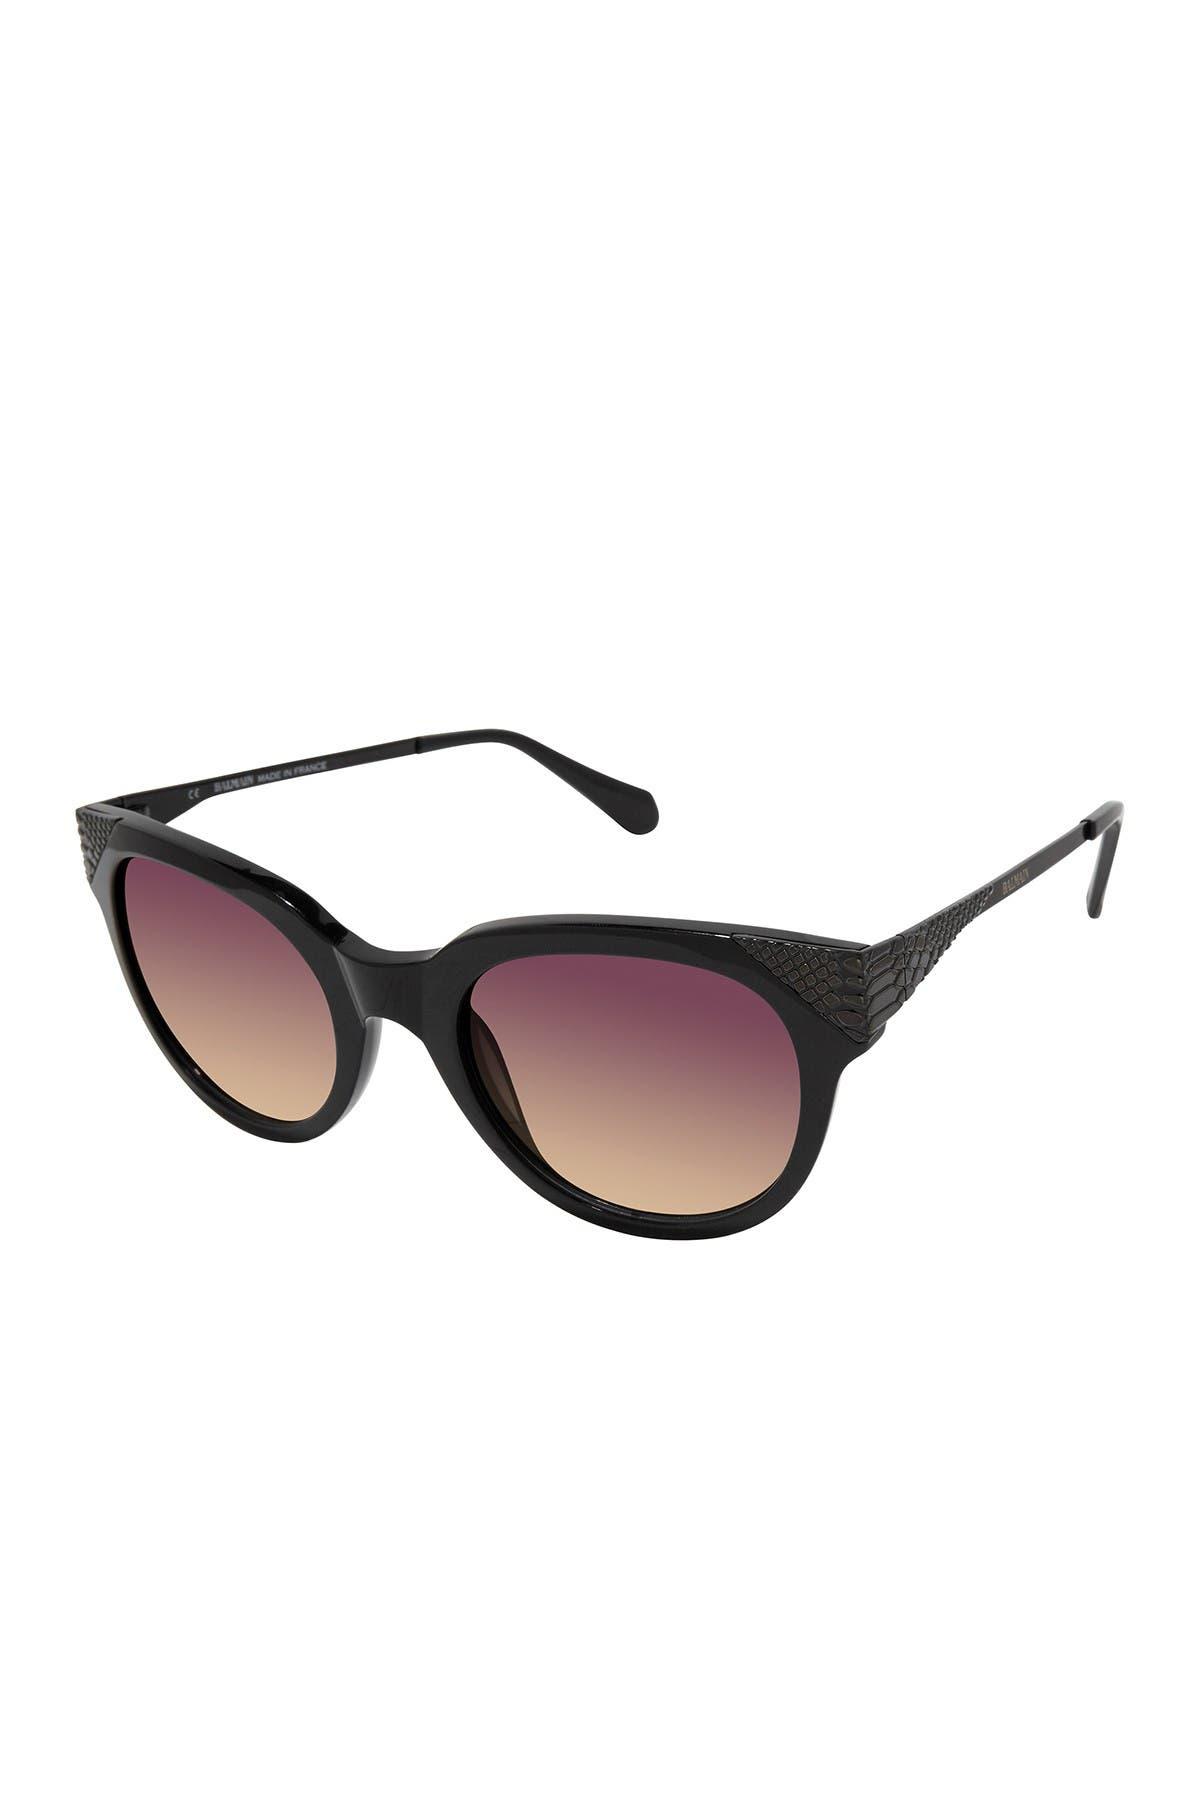 Image of Balmain 53mm Modified Cat Eye Sunglasses